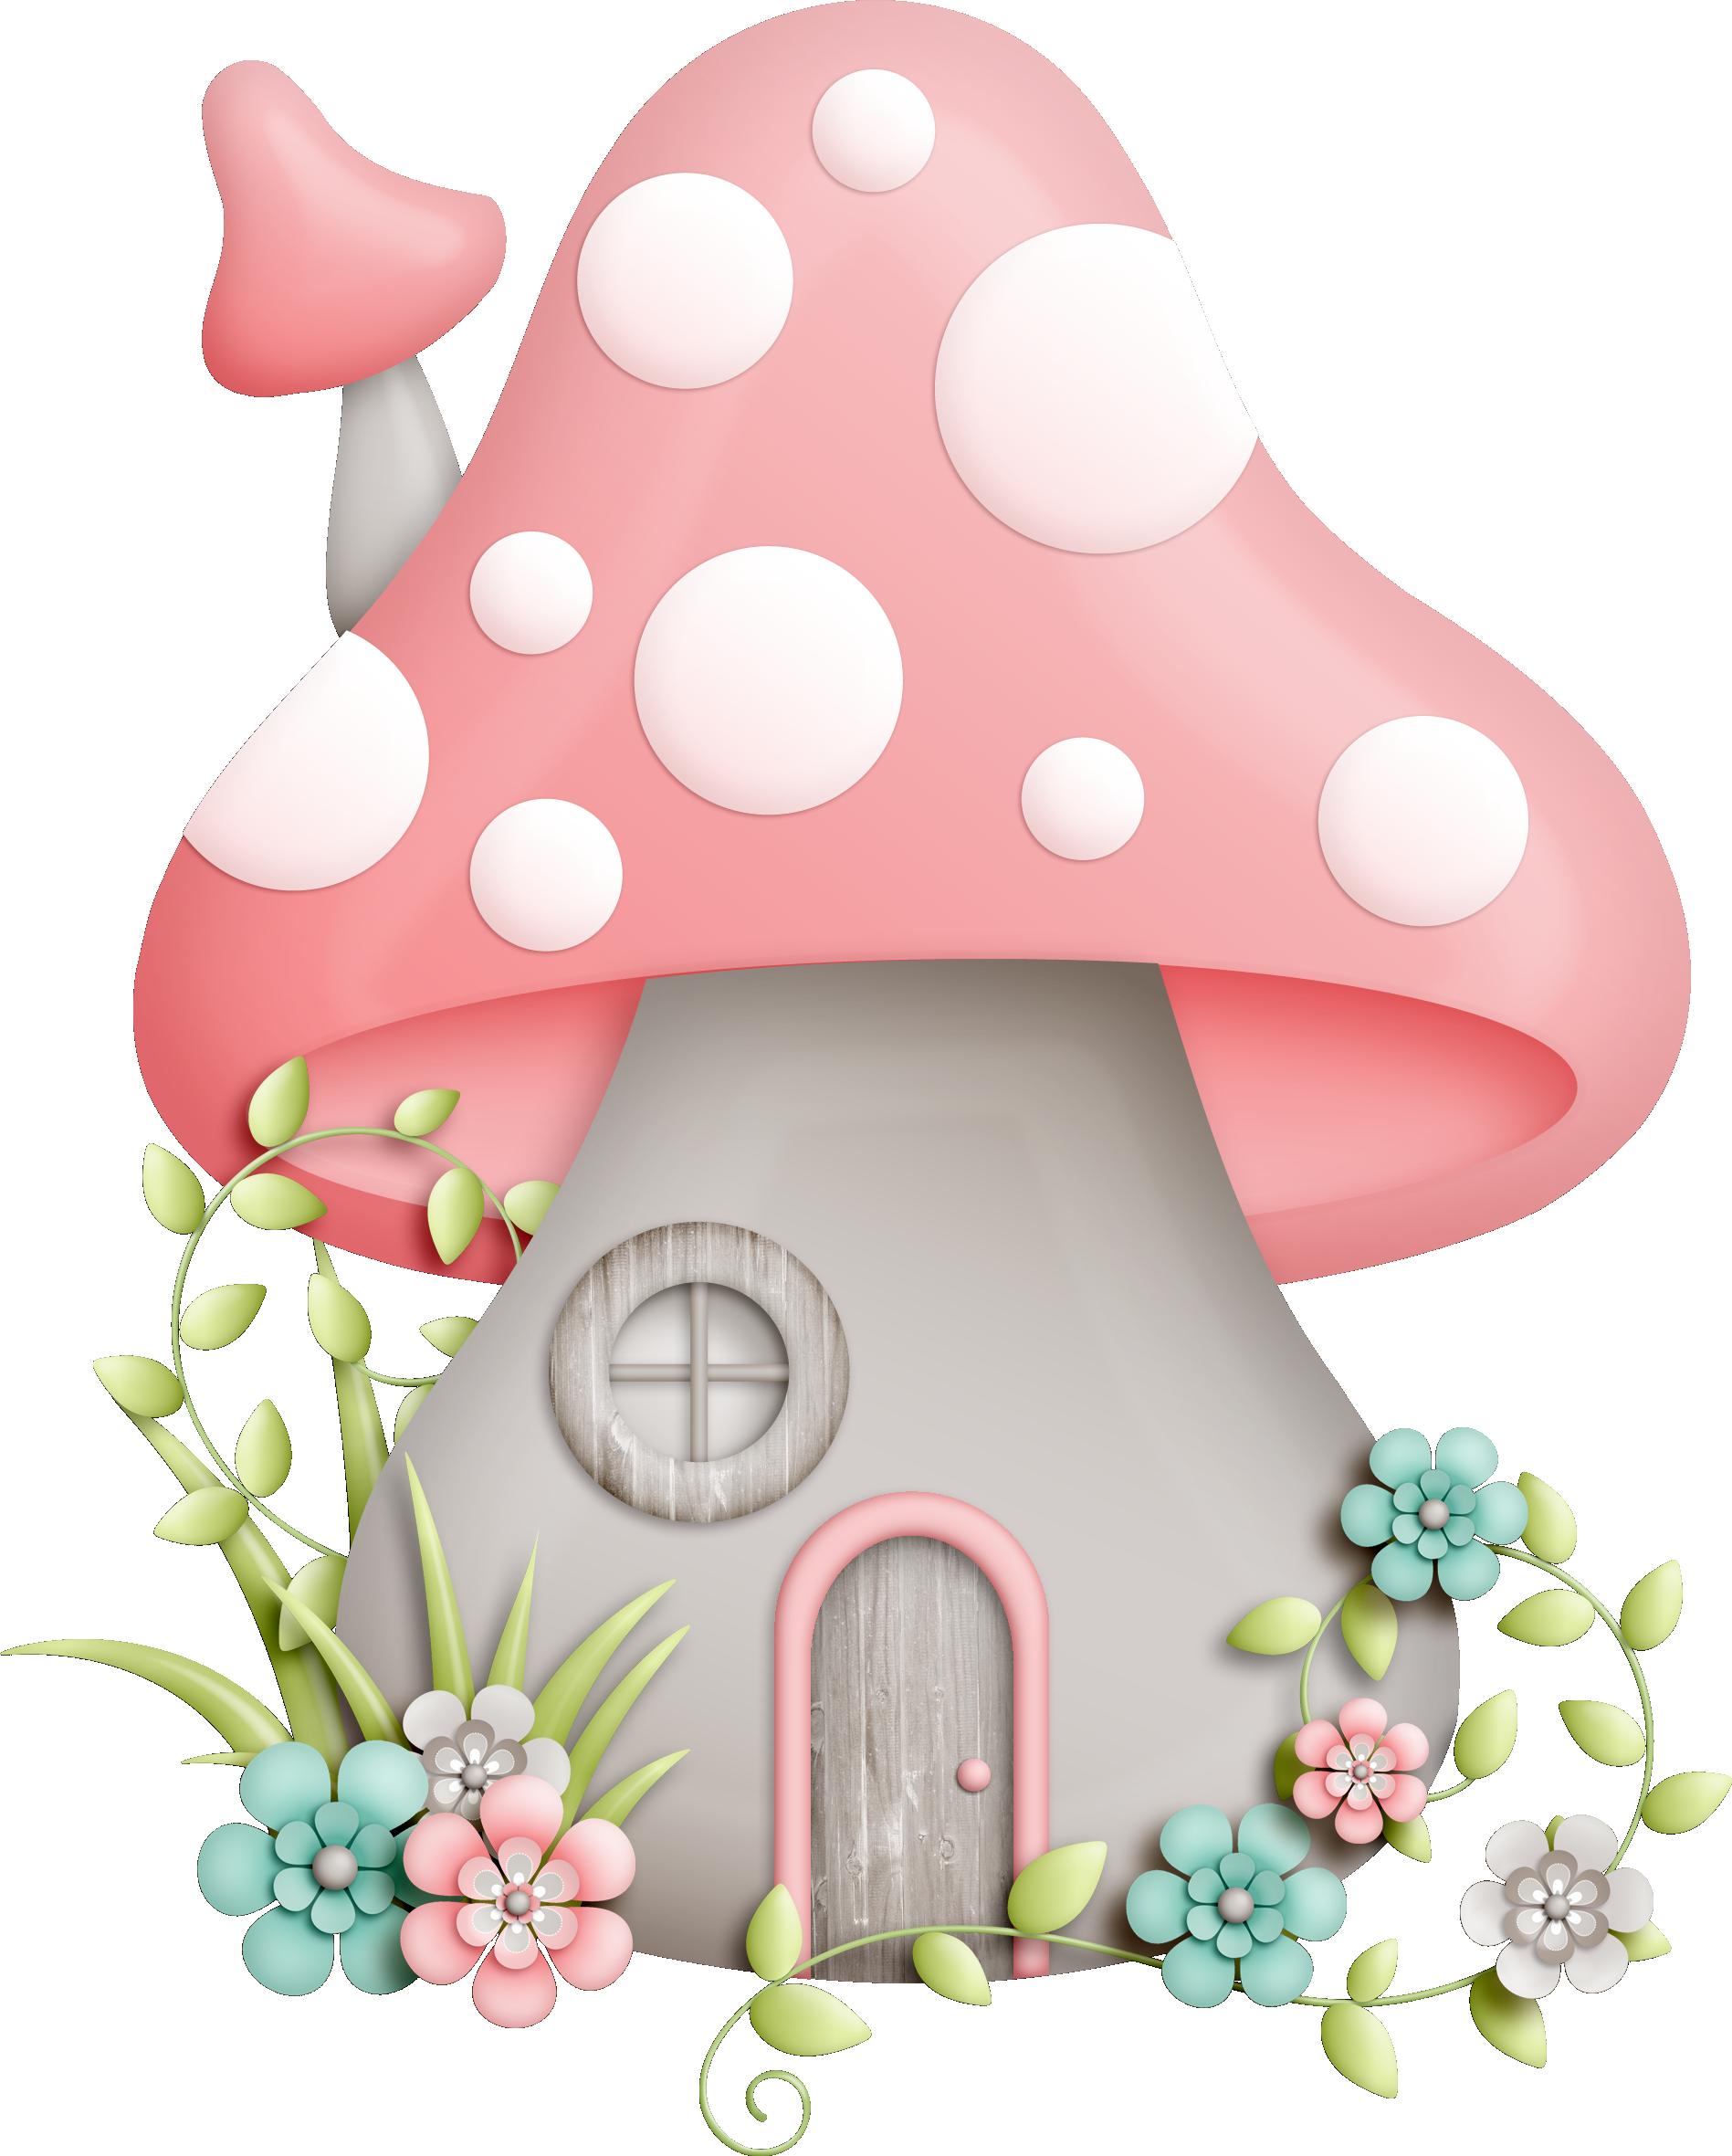 Mushrooms clipart kid. Pin by teresa prexl